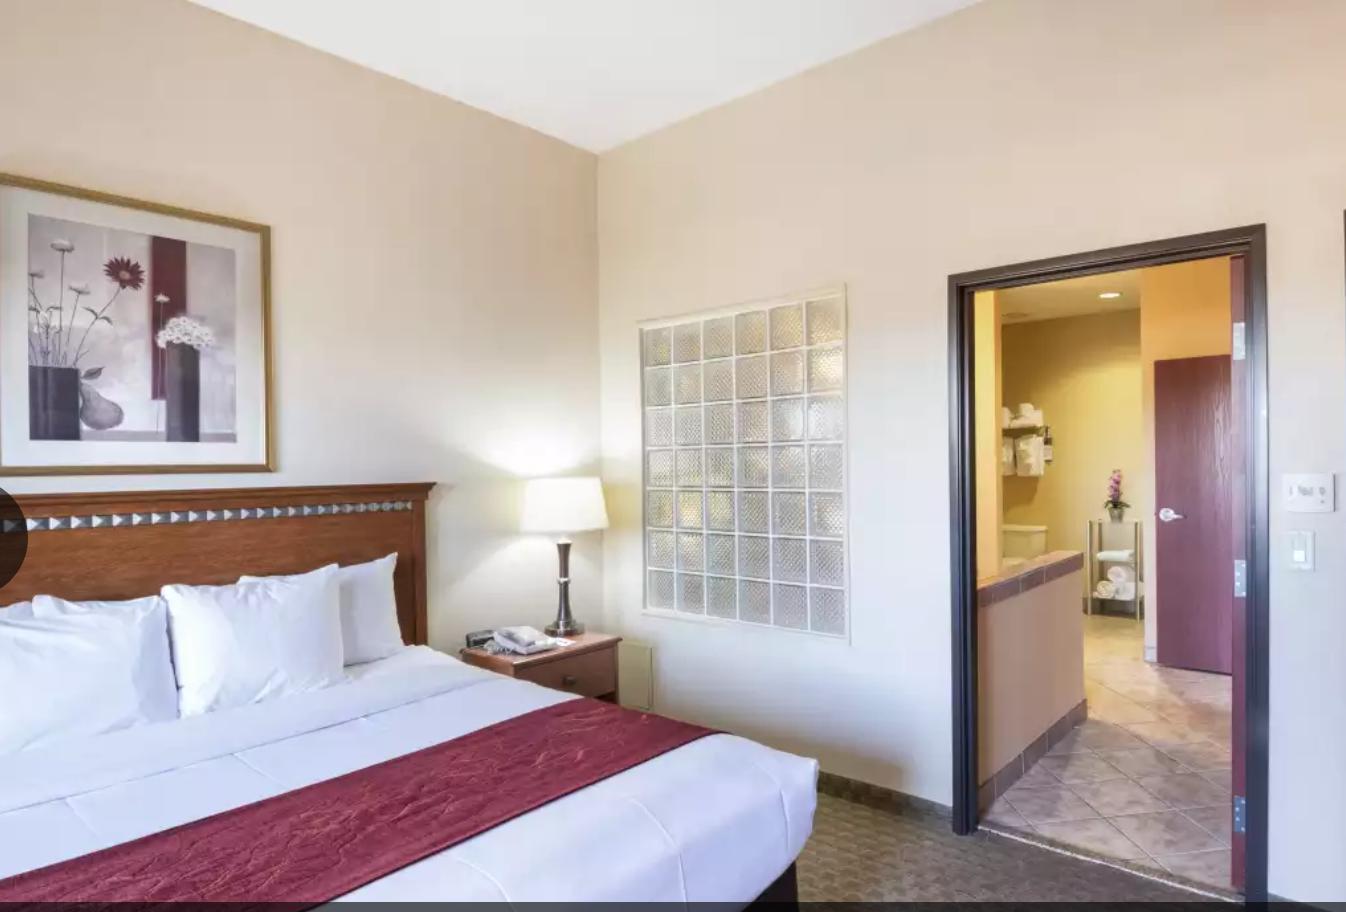 https://www.hotelsbyday.com/_data/default-hotel_image/4/20460/screenshot-2020-08-13-at-12-30-19-pm.png